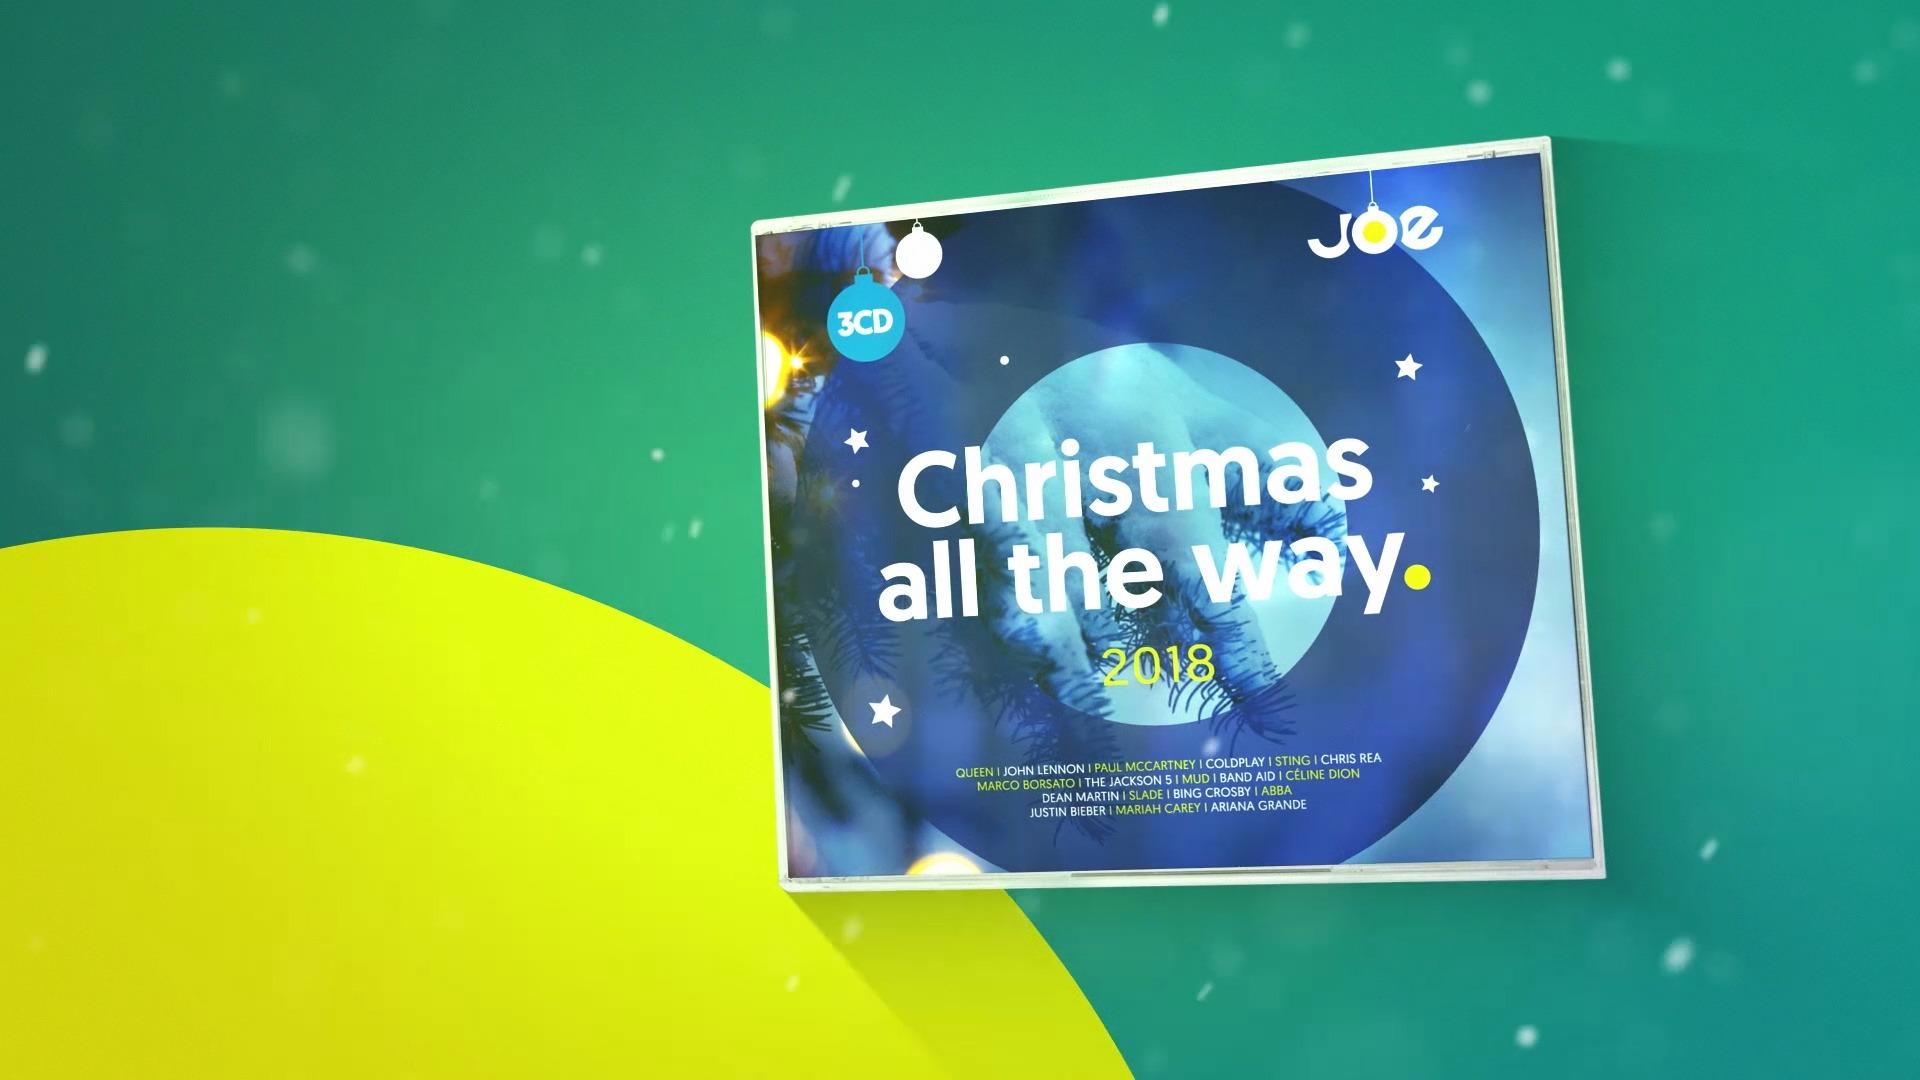 Joe christmasalltheway cd